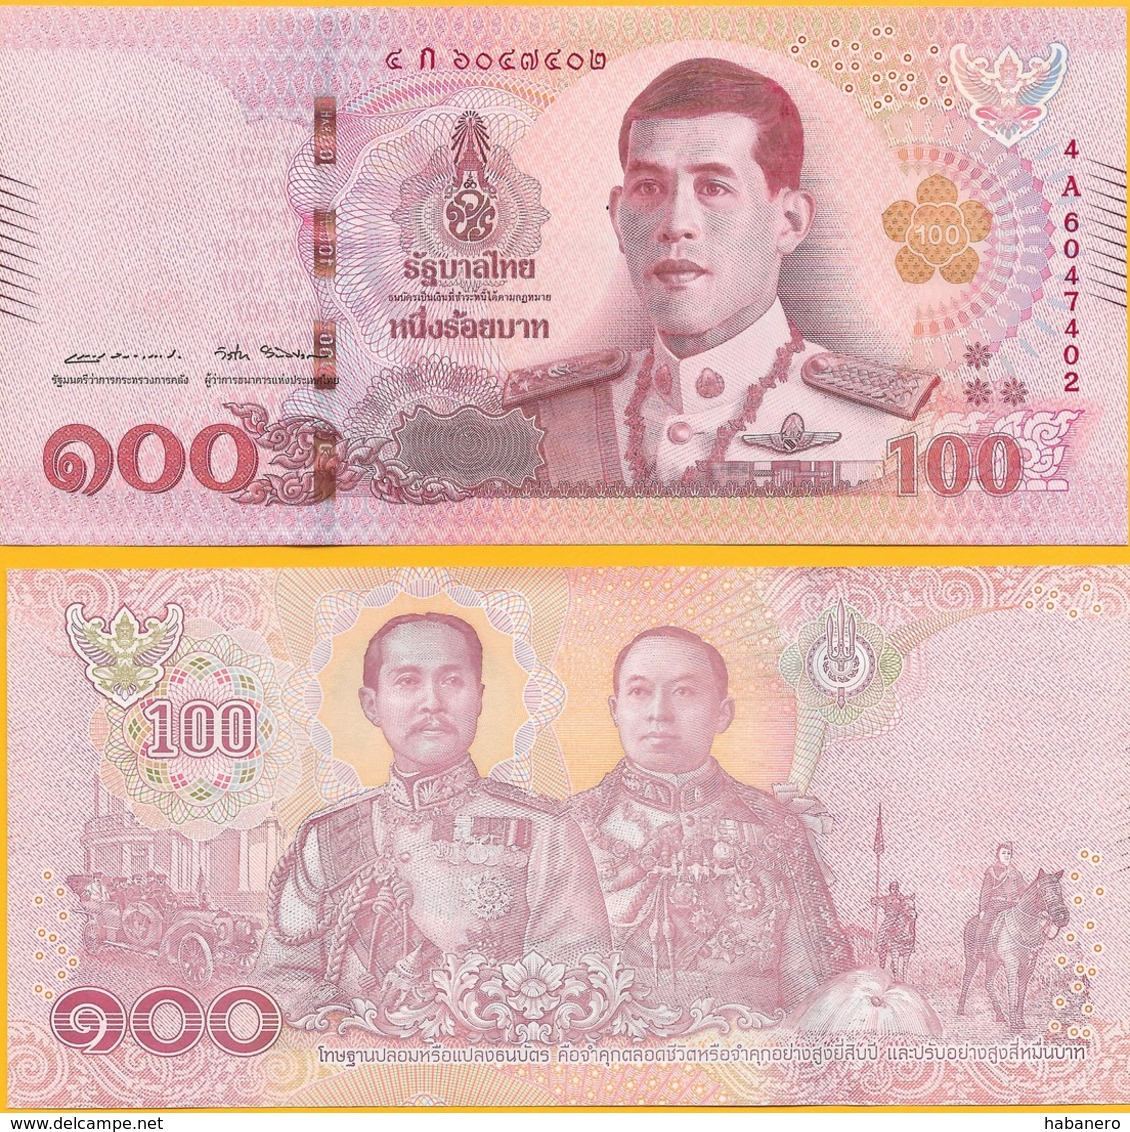 THAILAND NEW 100 BAHT 2018 KING MAHA VAJIRALONGKORN UNC MINT BANKNOTE - Thailand